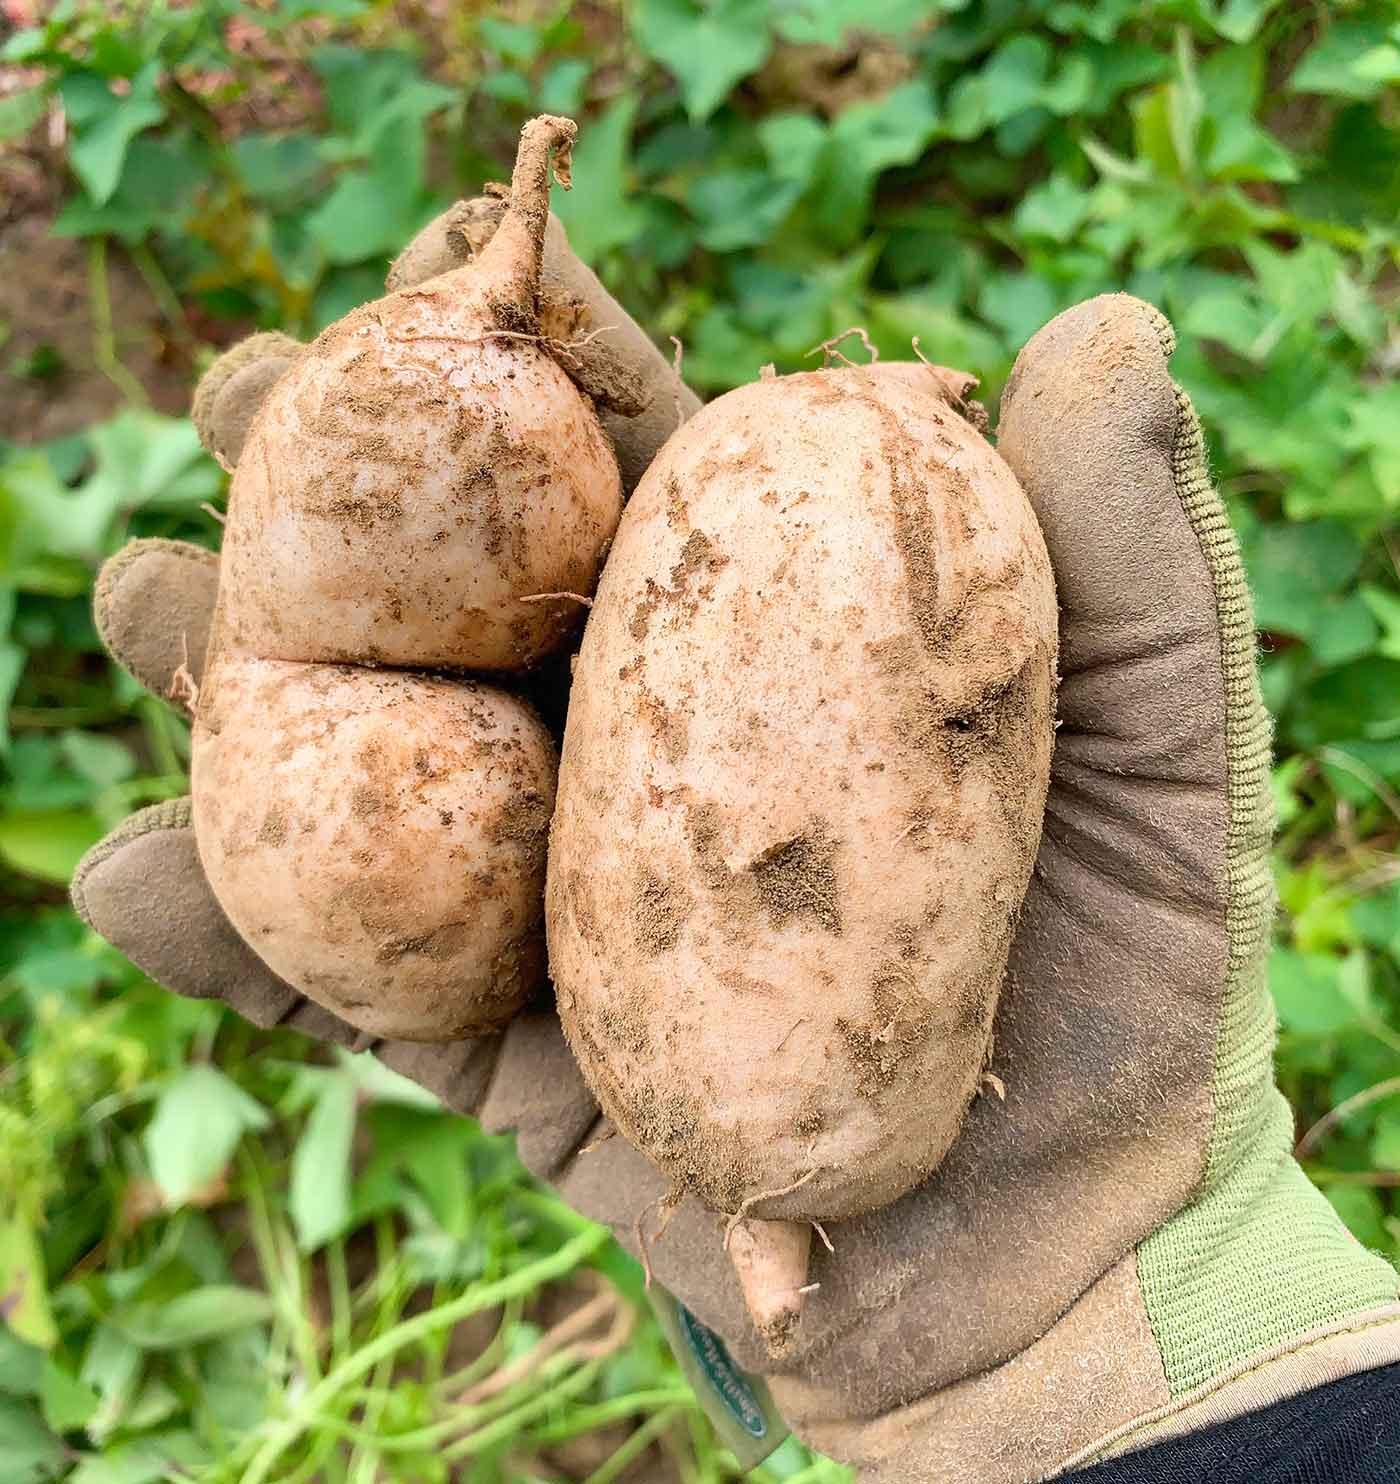 Gloved hand holding two freshly harvested Okinawan Sweet Potatoes.